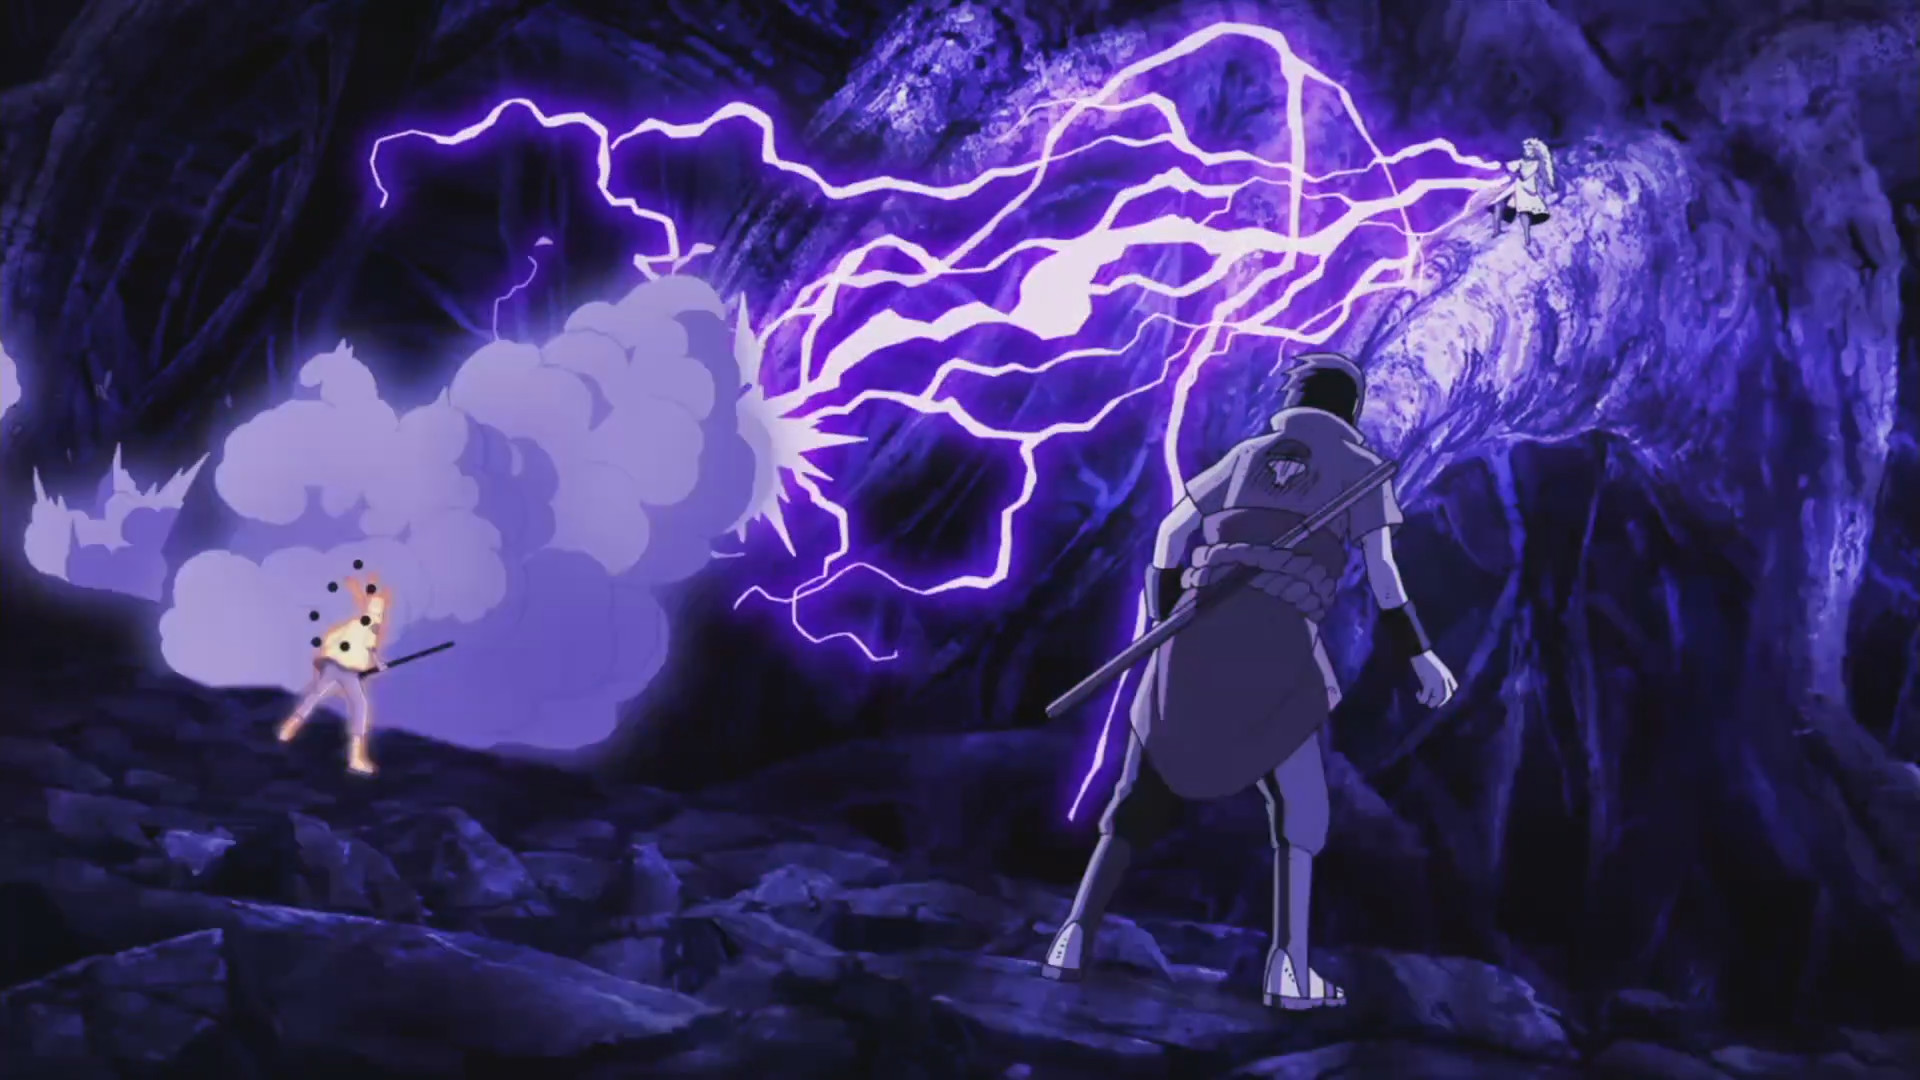 Wallpaper Sasuke 3d Keren Naruto And Sasuke Vs Madara Wallpapers 54 Images